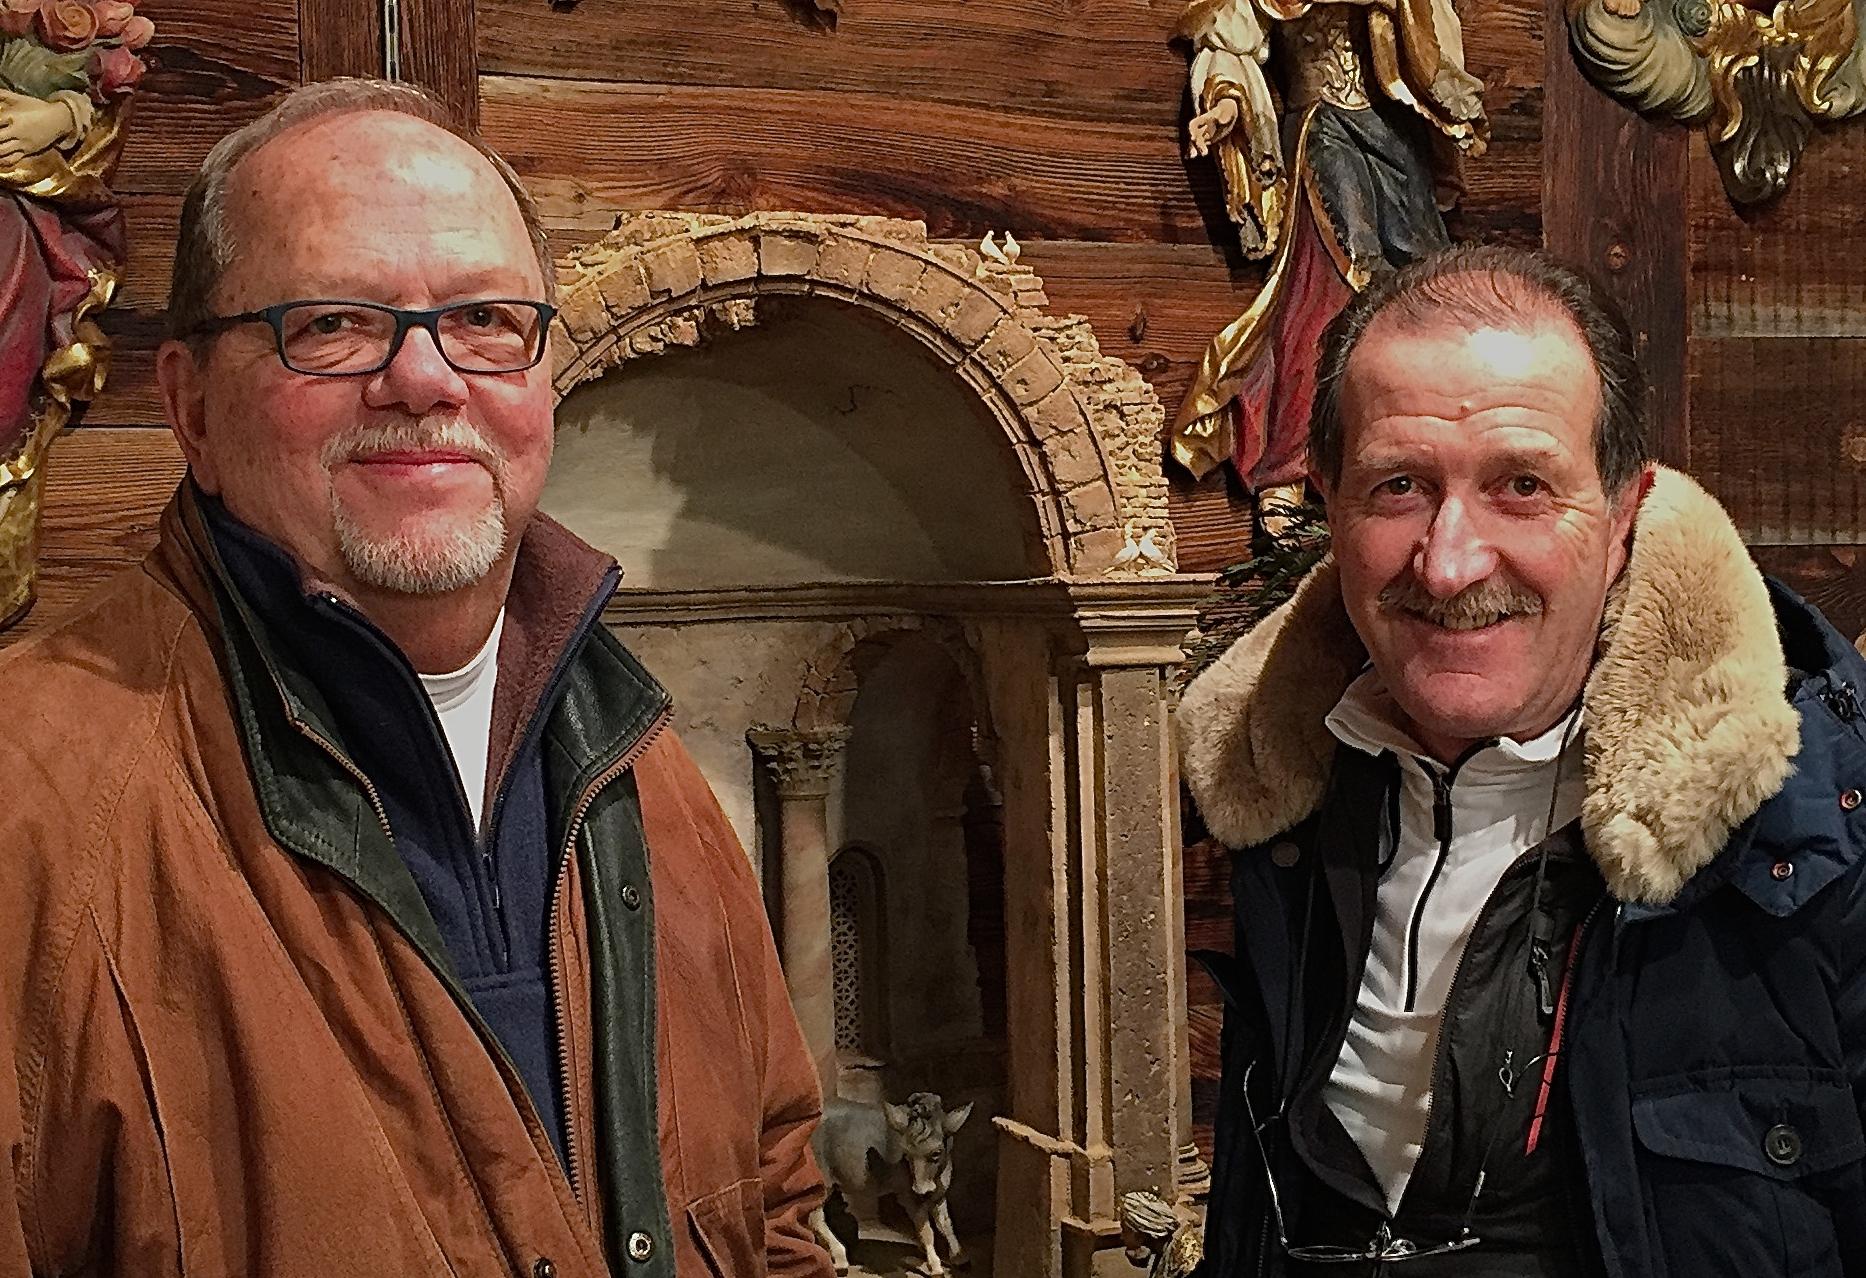 Michael and sculptor Heinrich Demetz in Val Gardena at his Heide Studio & Museum